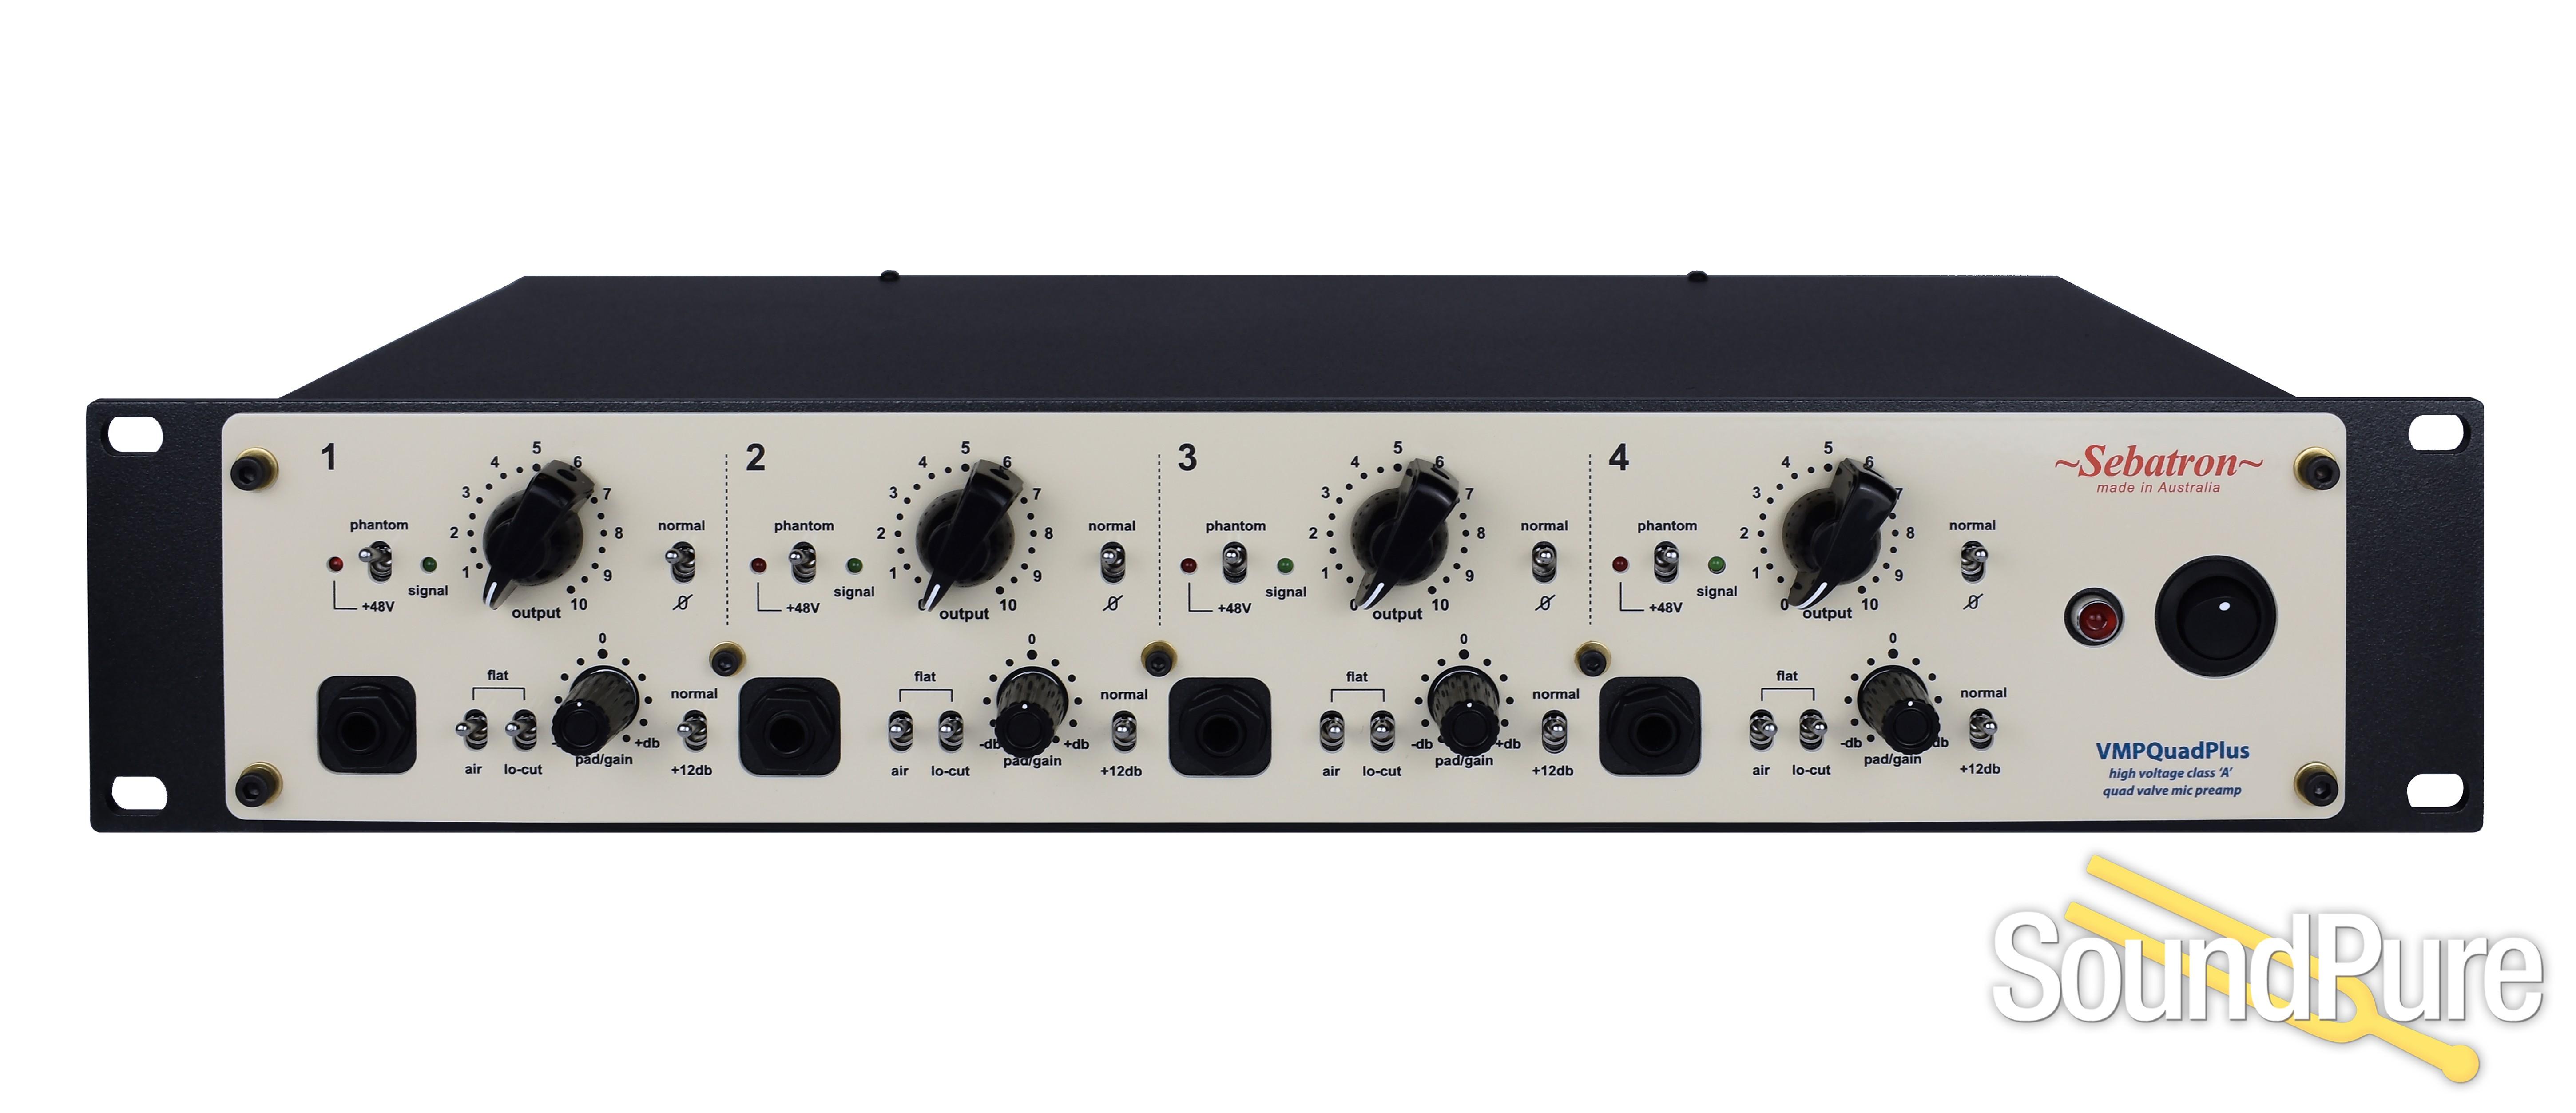 Sebatron VMPQuadPlus 4 Channel Tube Mic Pre | Soundpure com